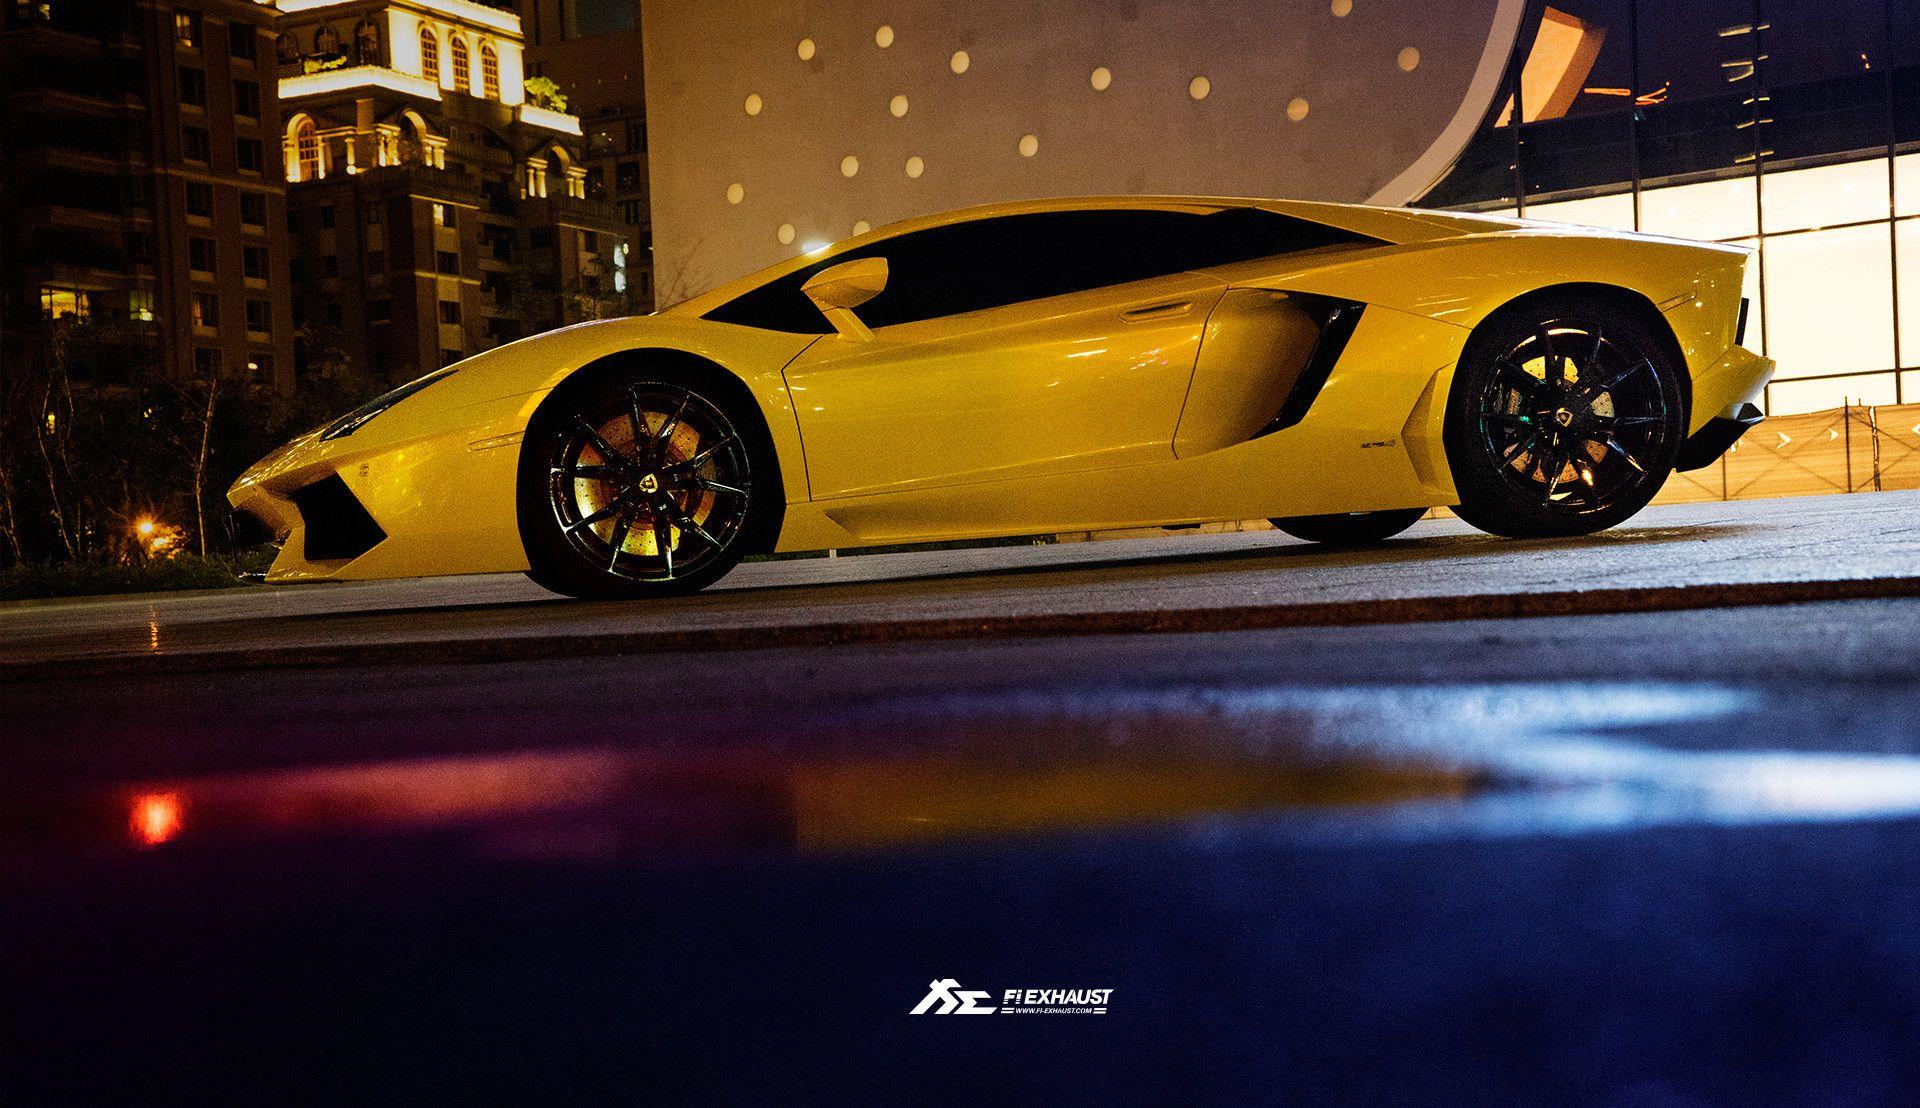 1920x1108 Lamborghini Lp700 Yellow Wallpaper Gold